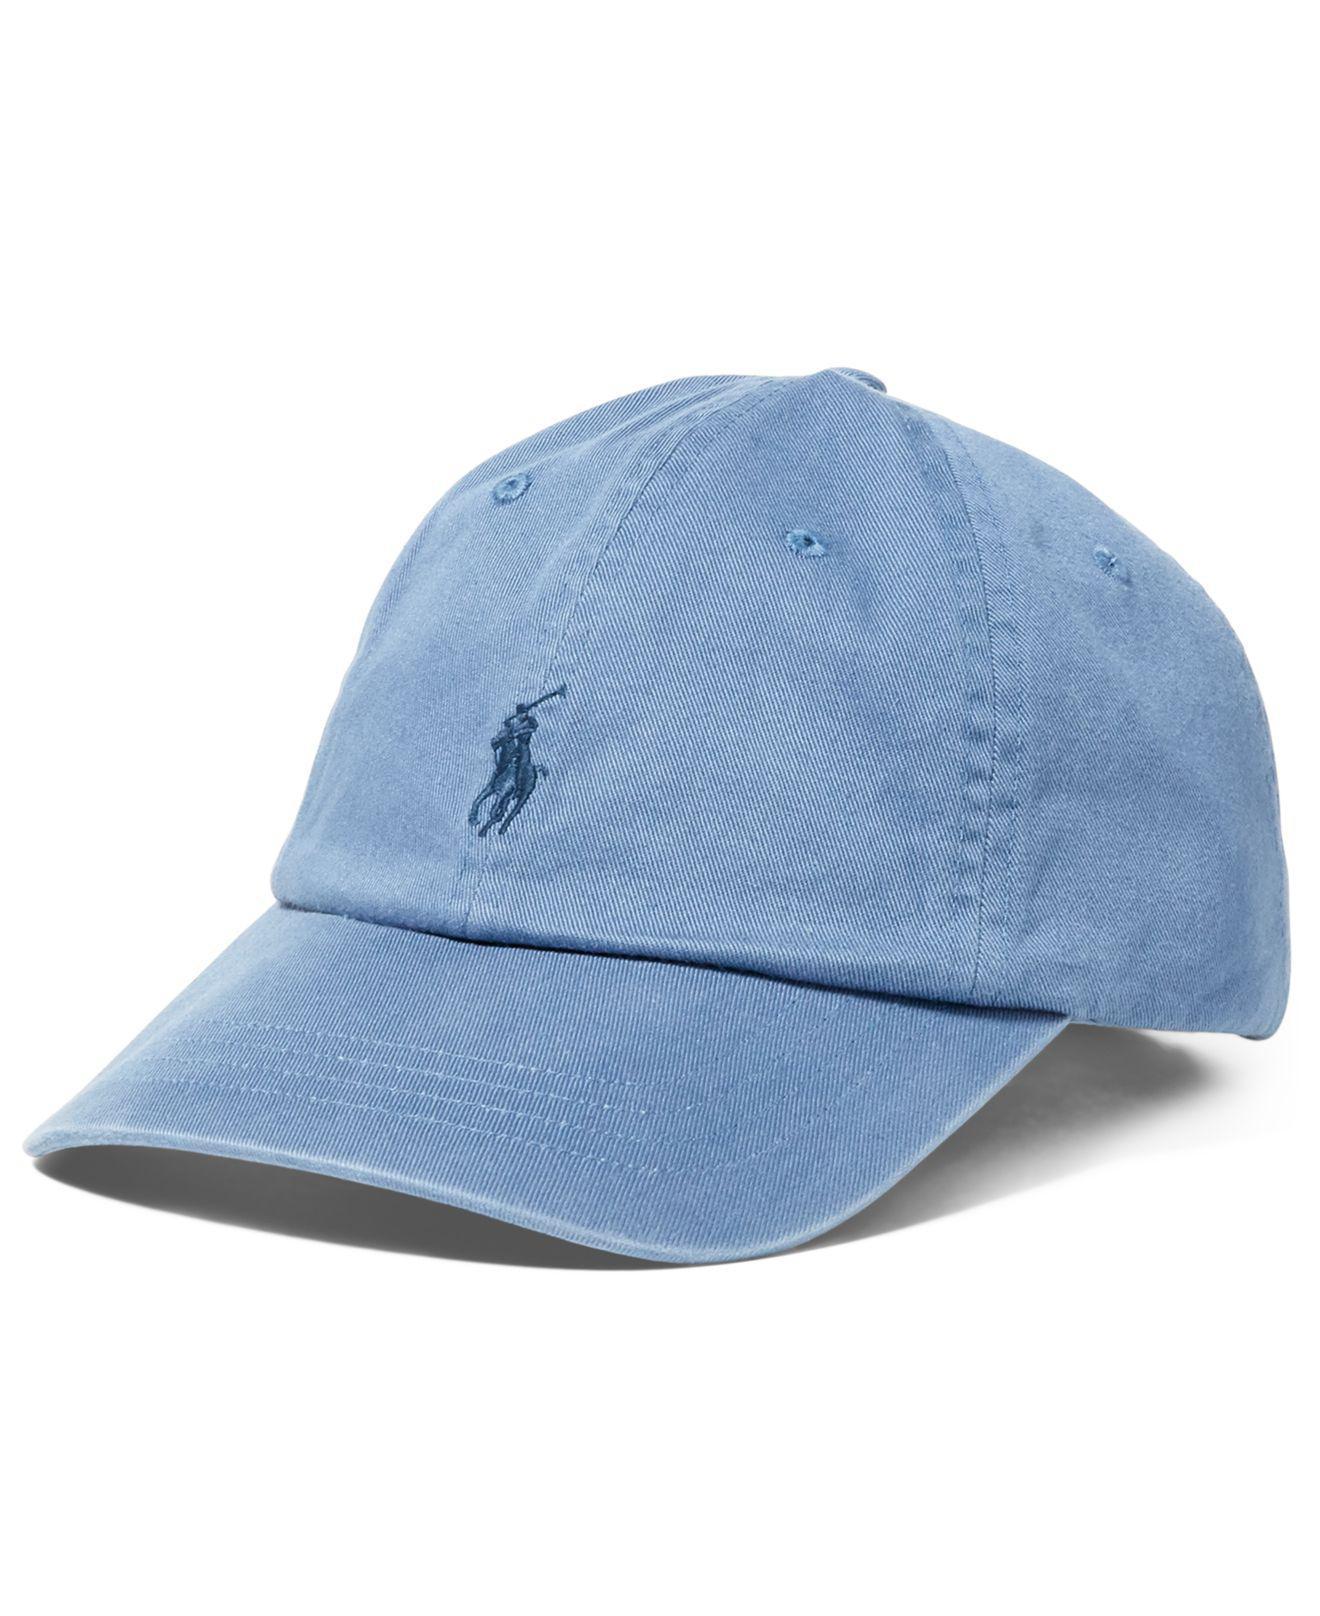 e26dcf1939e8b Polo Ralph Lauren Classic Sport Cap in Blue for Men - Save 39% - Lyst